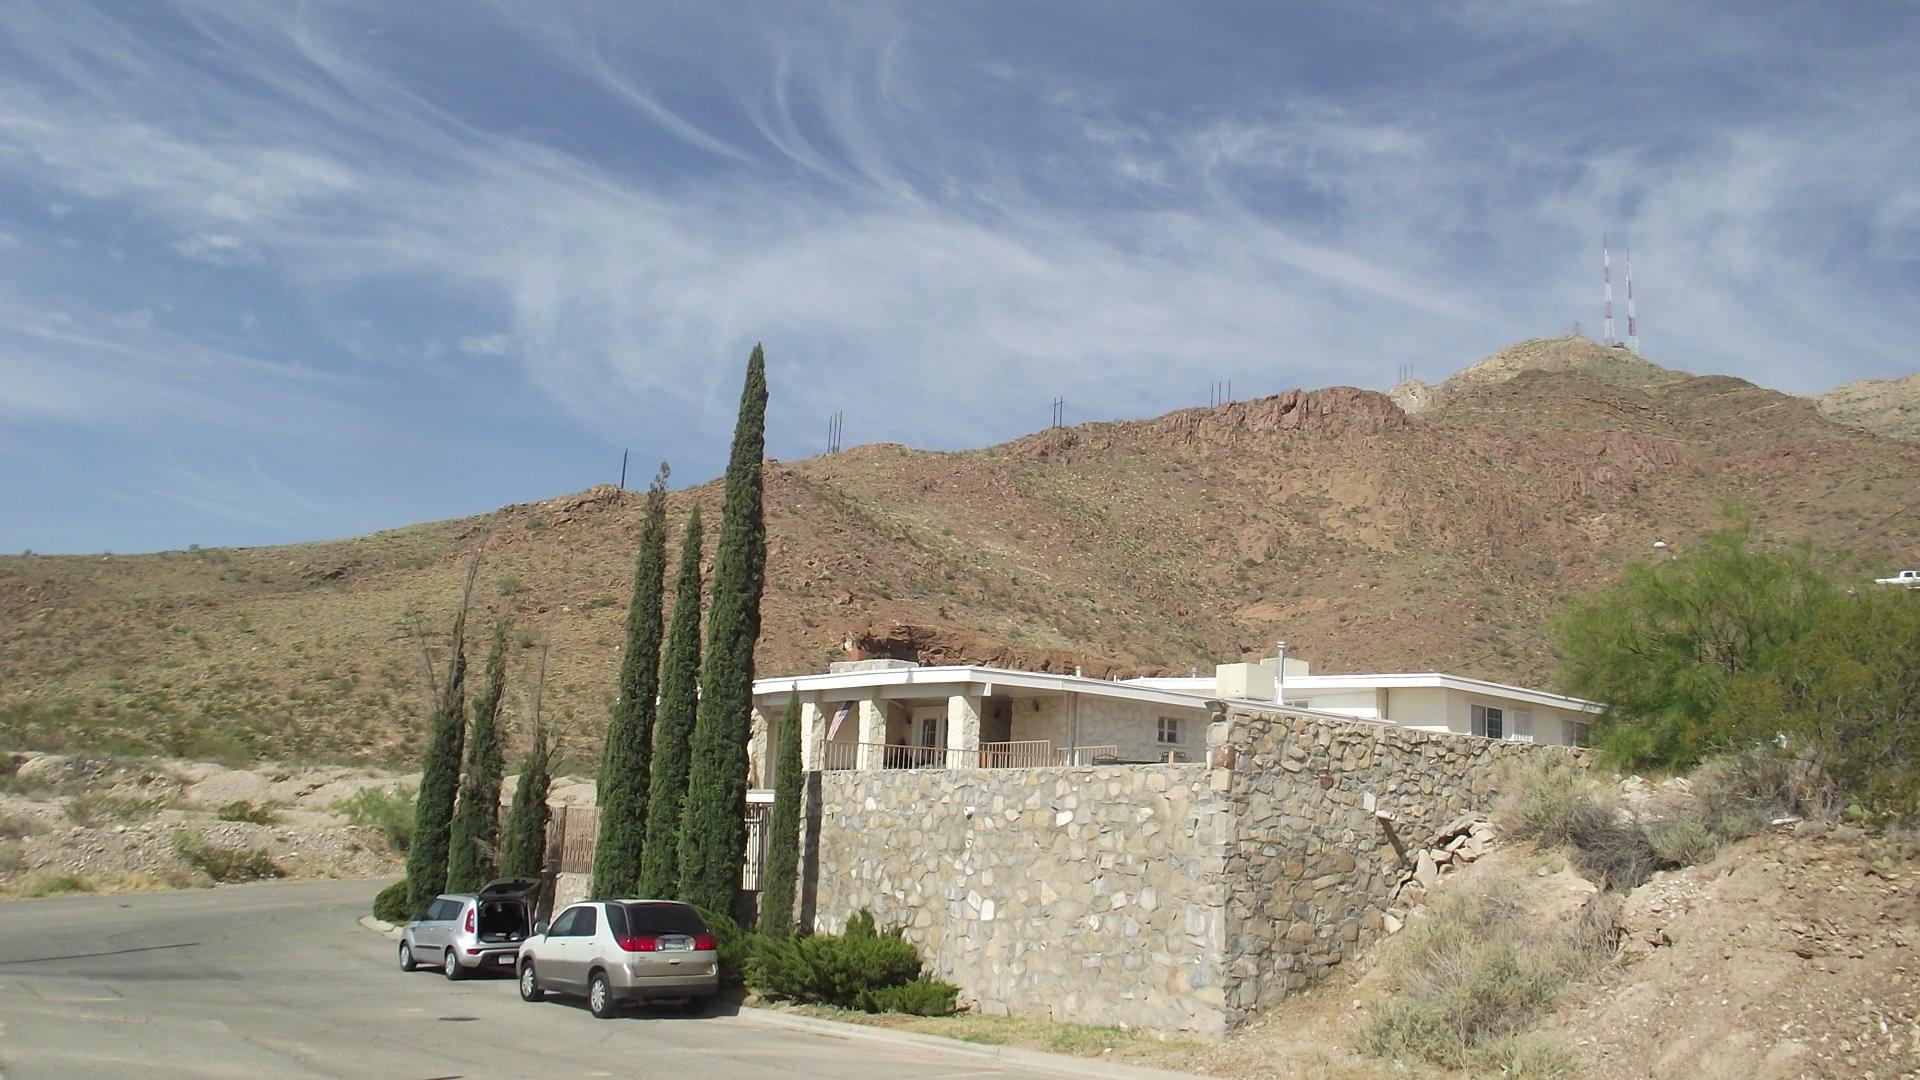 2333 Morehead Avenue, El Paso, Texas 79930, ,1 BathroomBathrooms,Residential Rental,For Rent,Morehead,835945